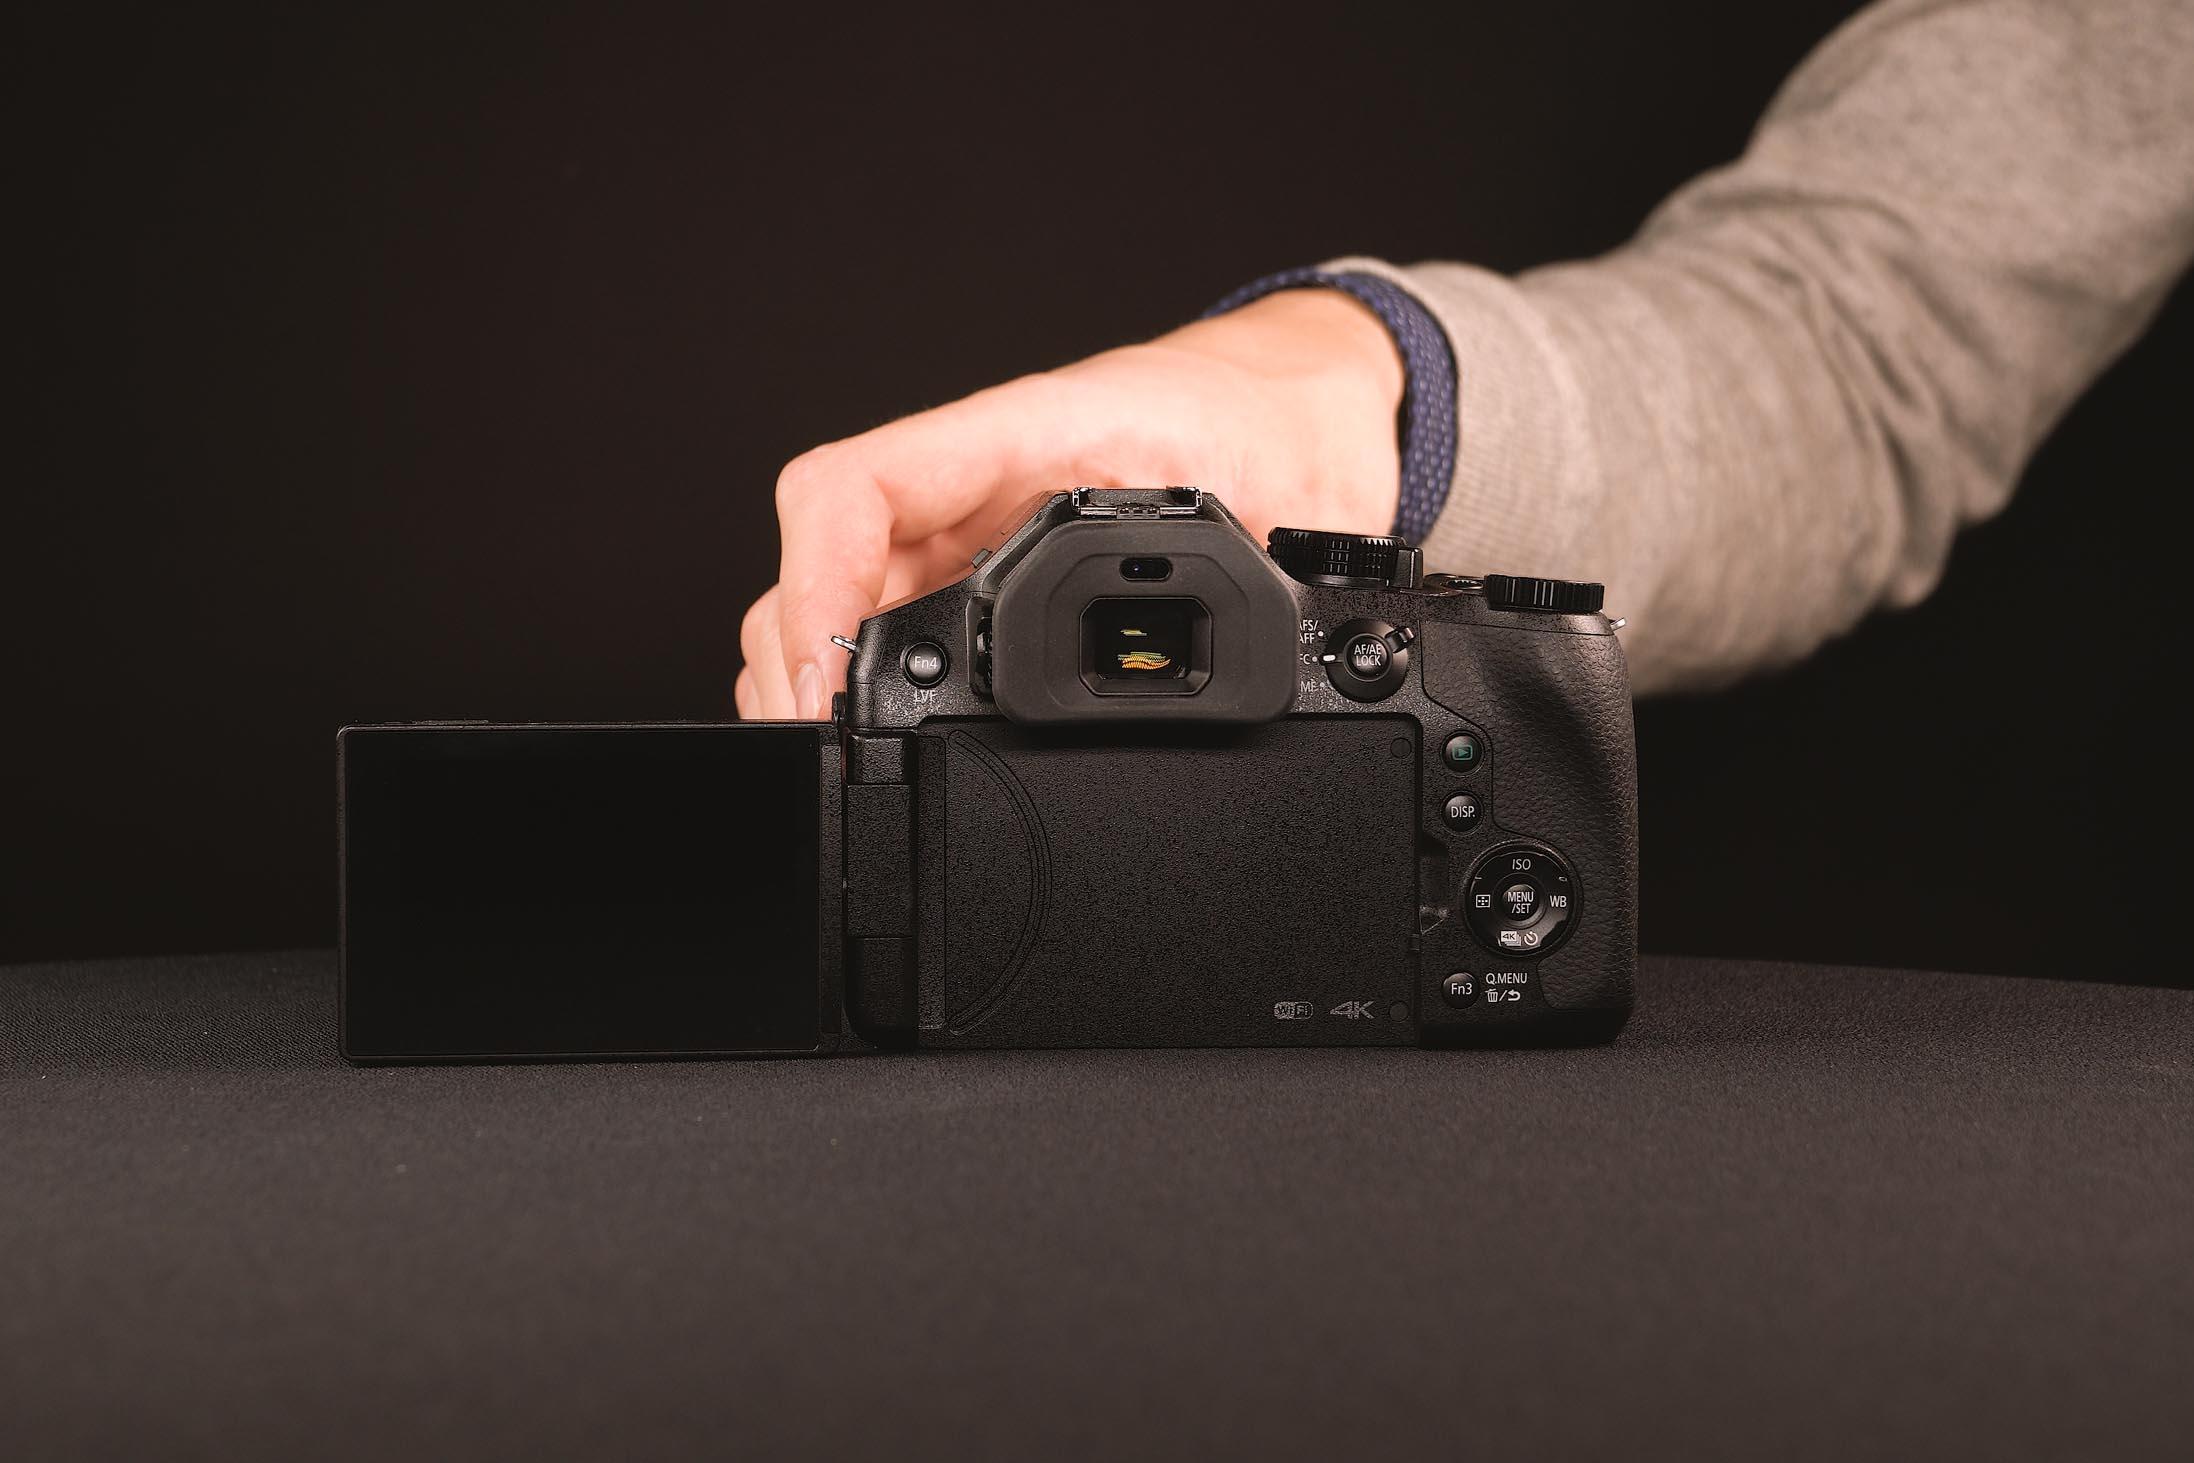 Lumix FZ 300 display